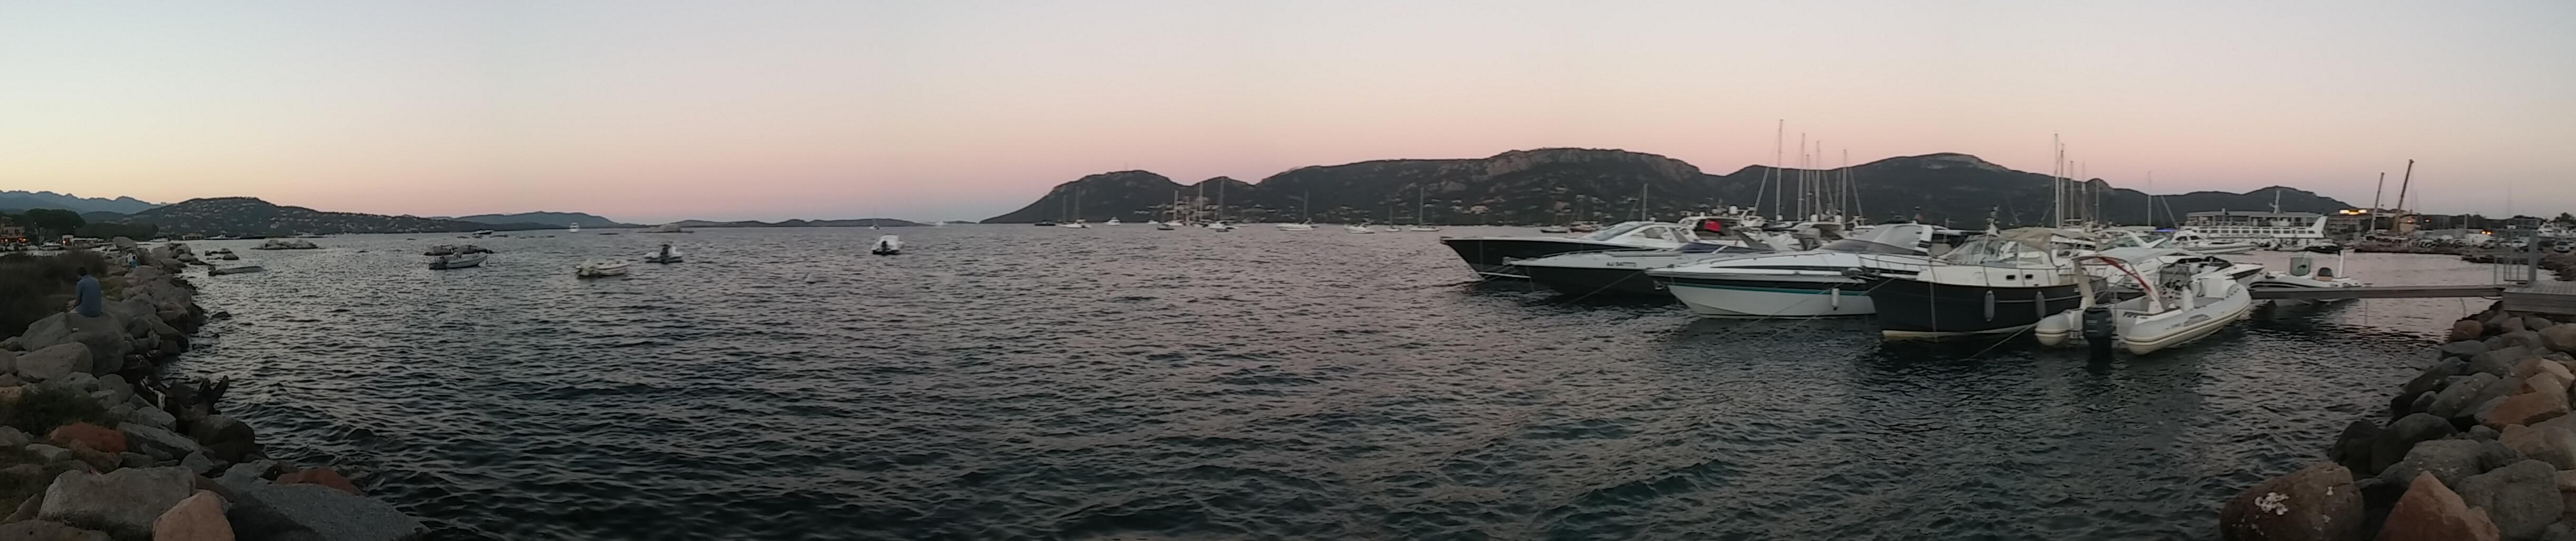 porto-vechio-panoramica-puerto